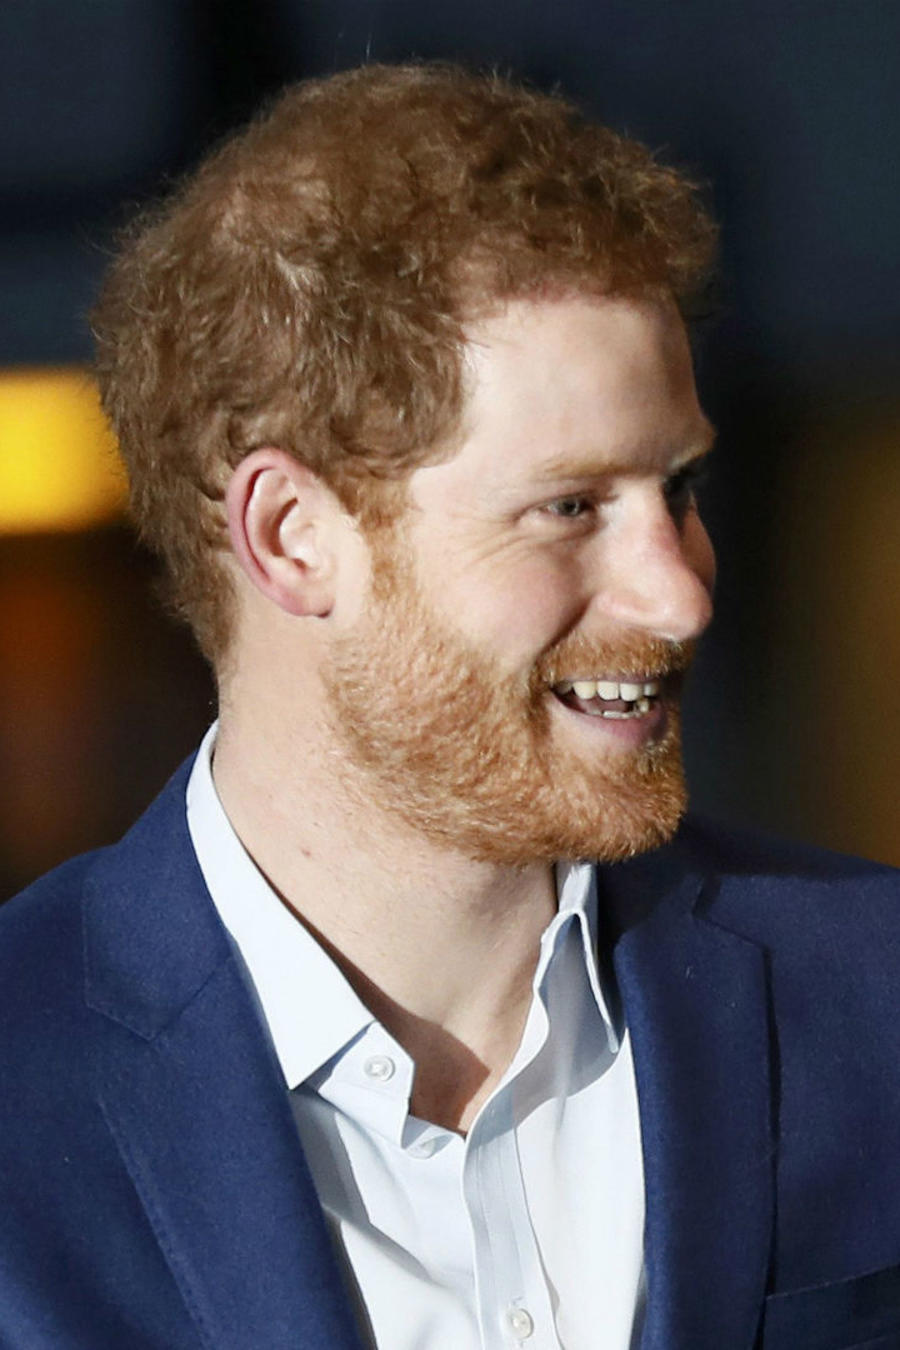 Príncipe Harry de perfil